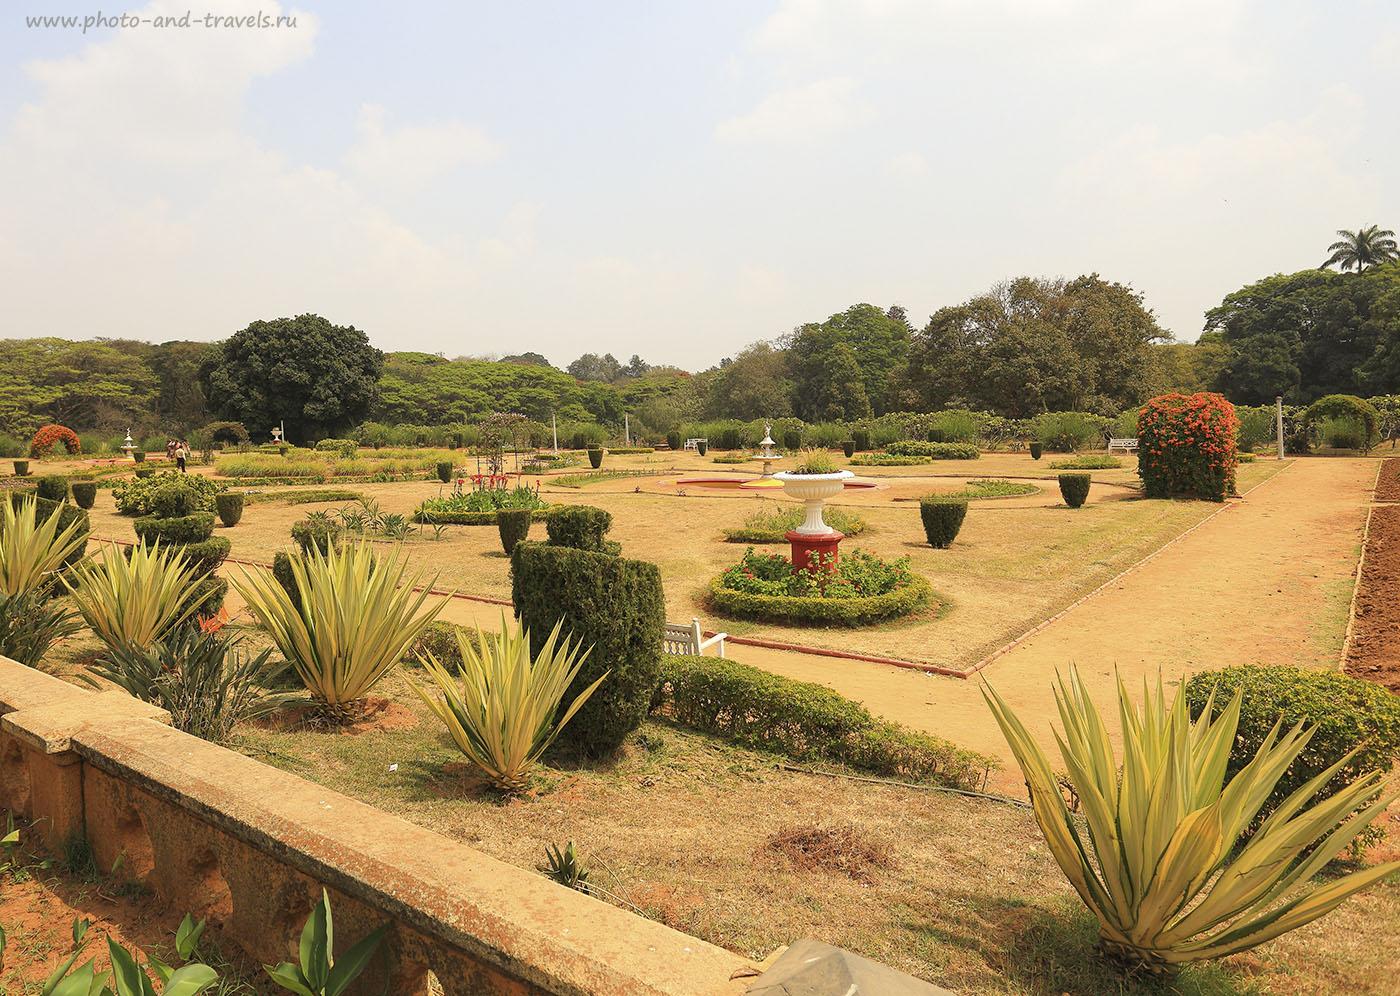 Фото 3. Поездка по штату Карнатака в Индии. Сад во Дворце